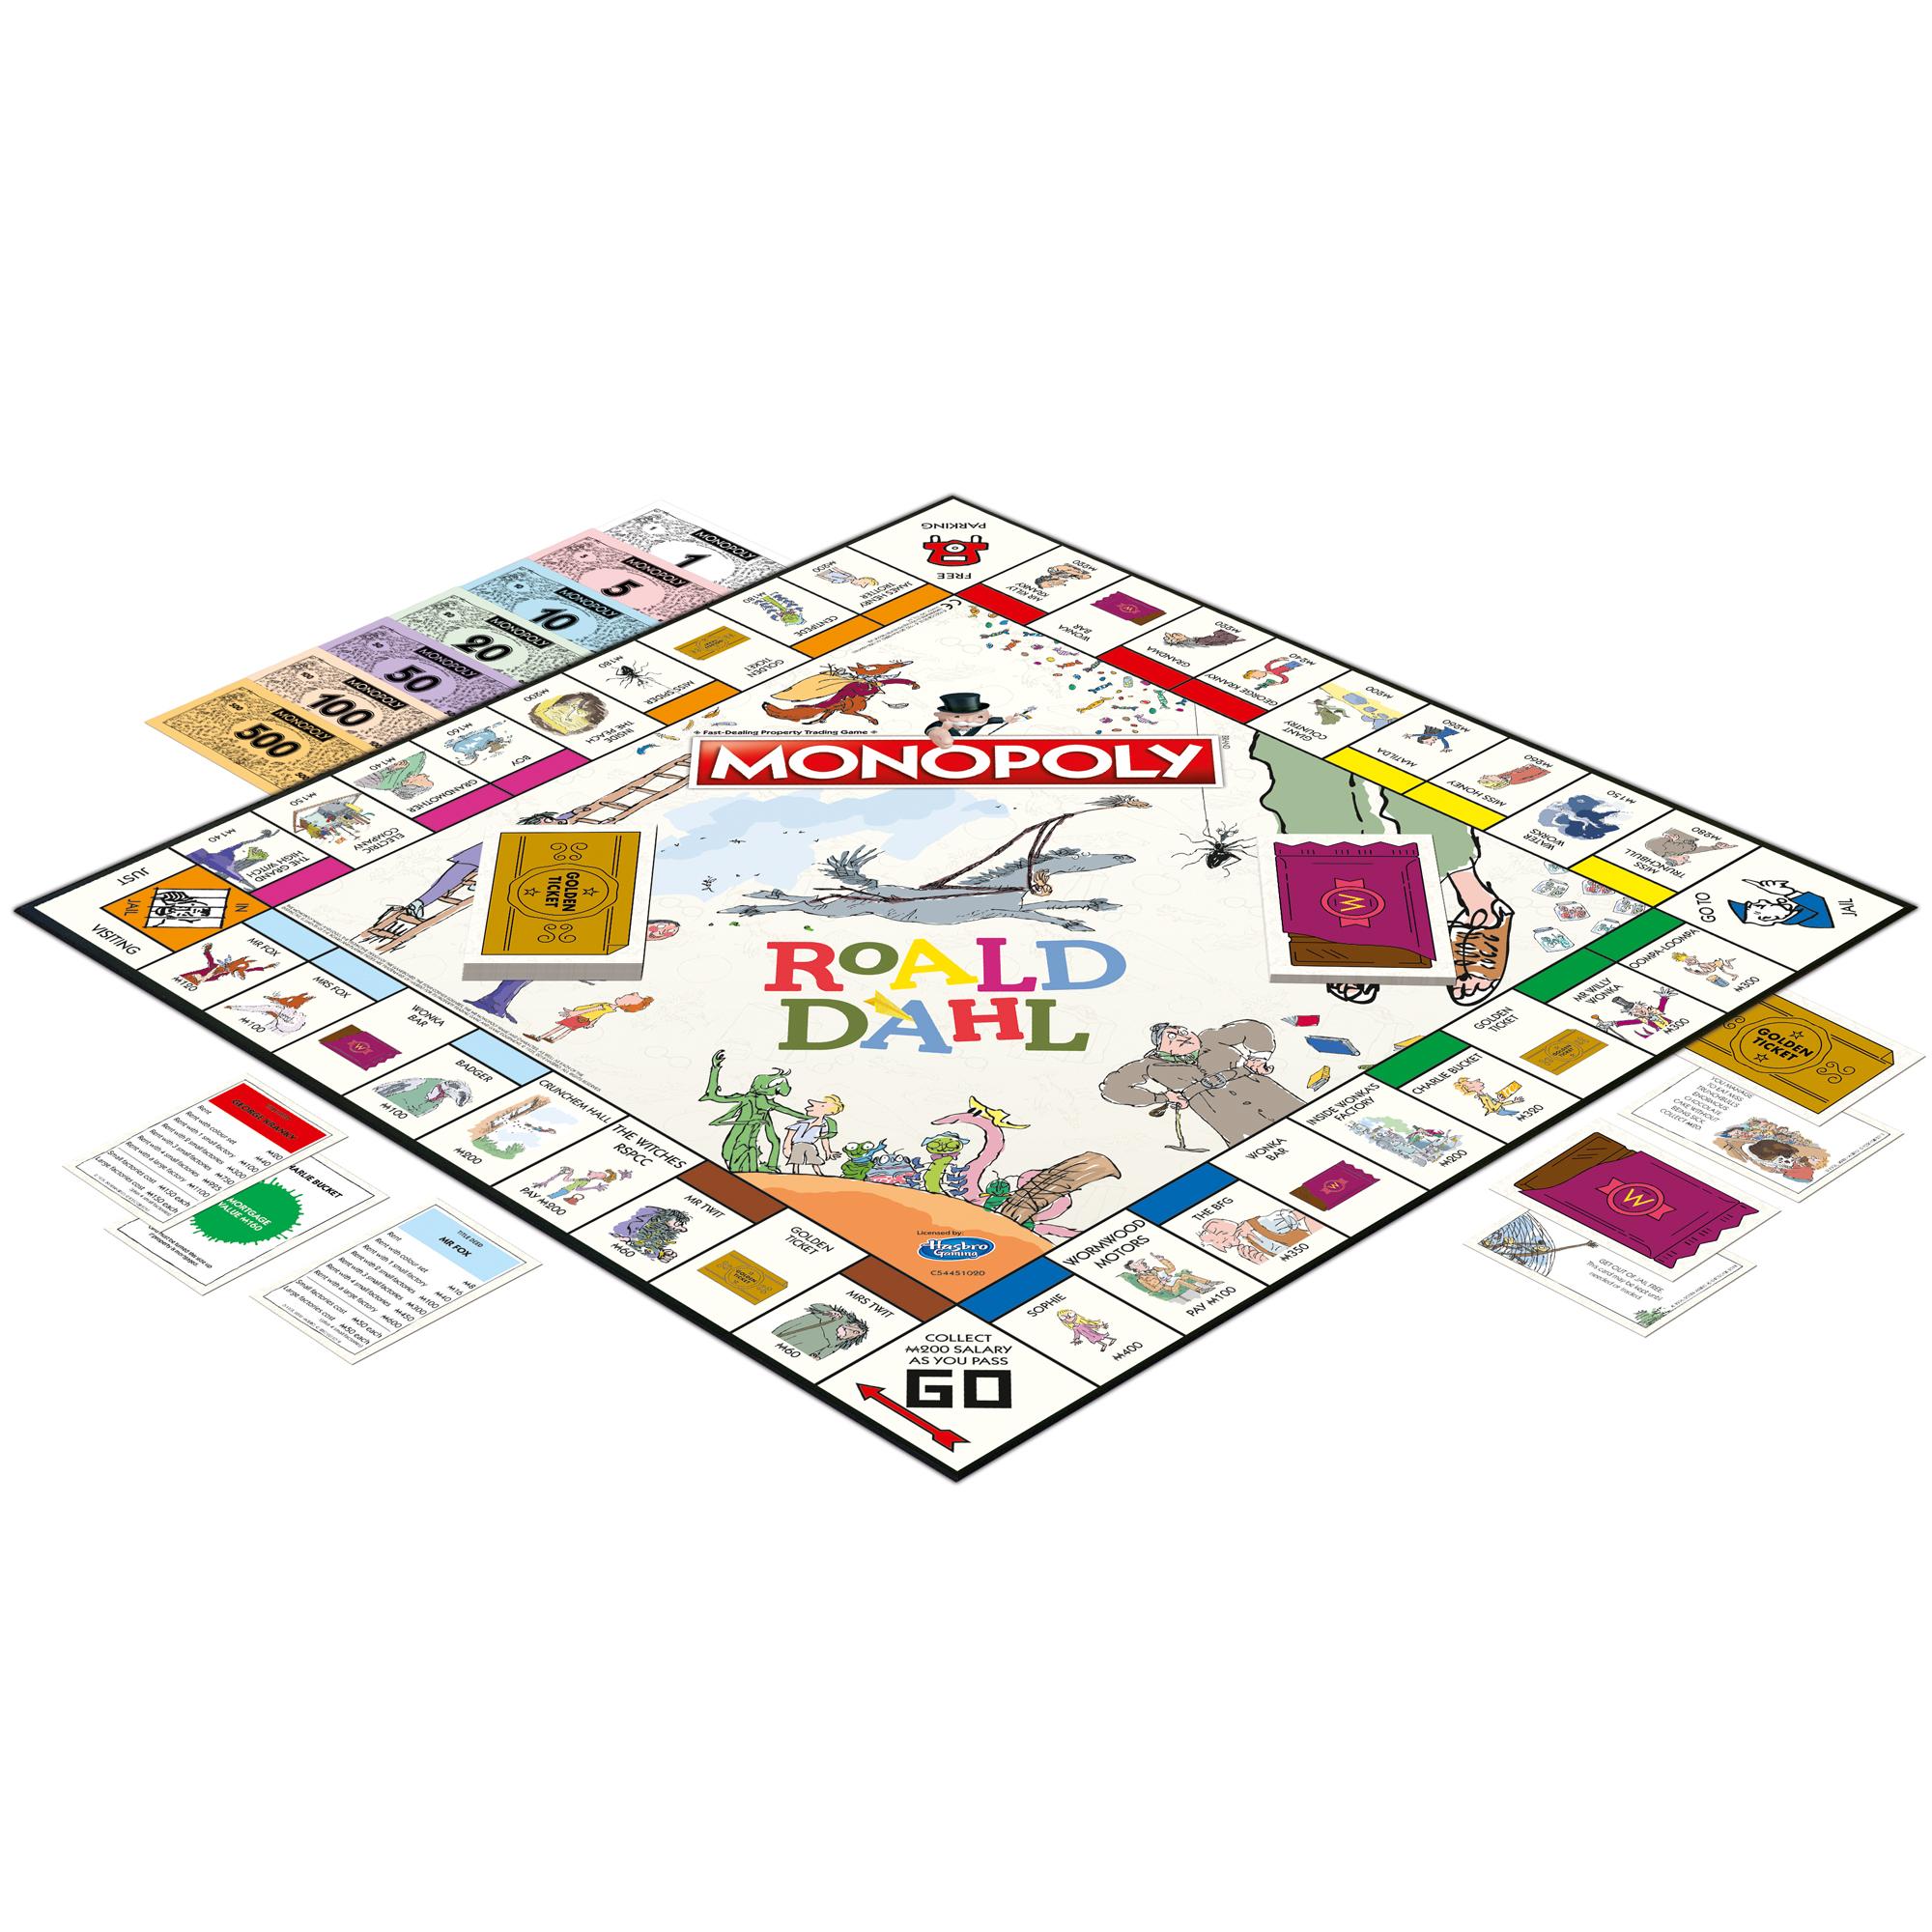 Monopoly - Roald Dahl